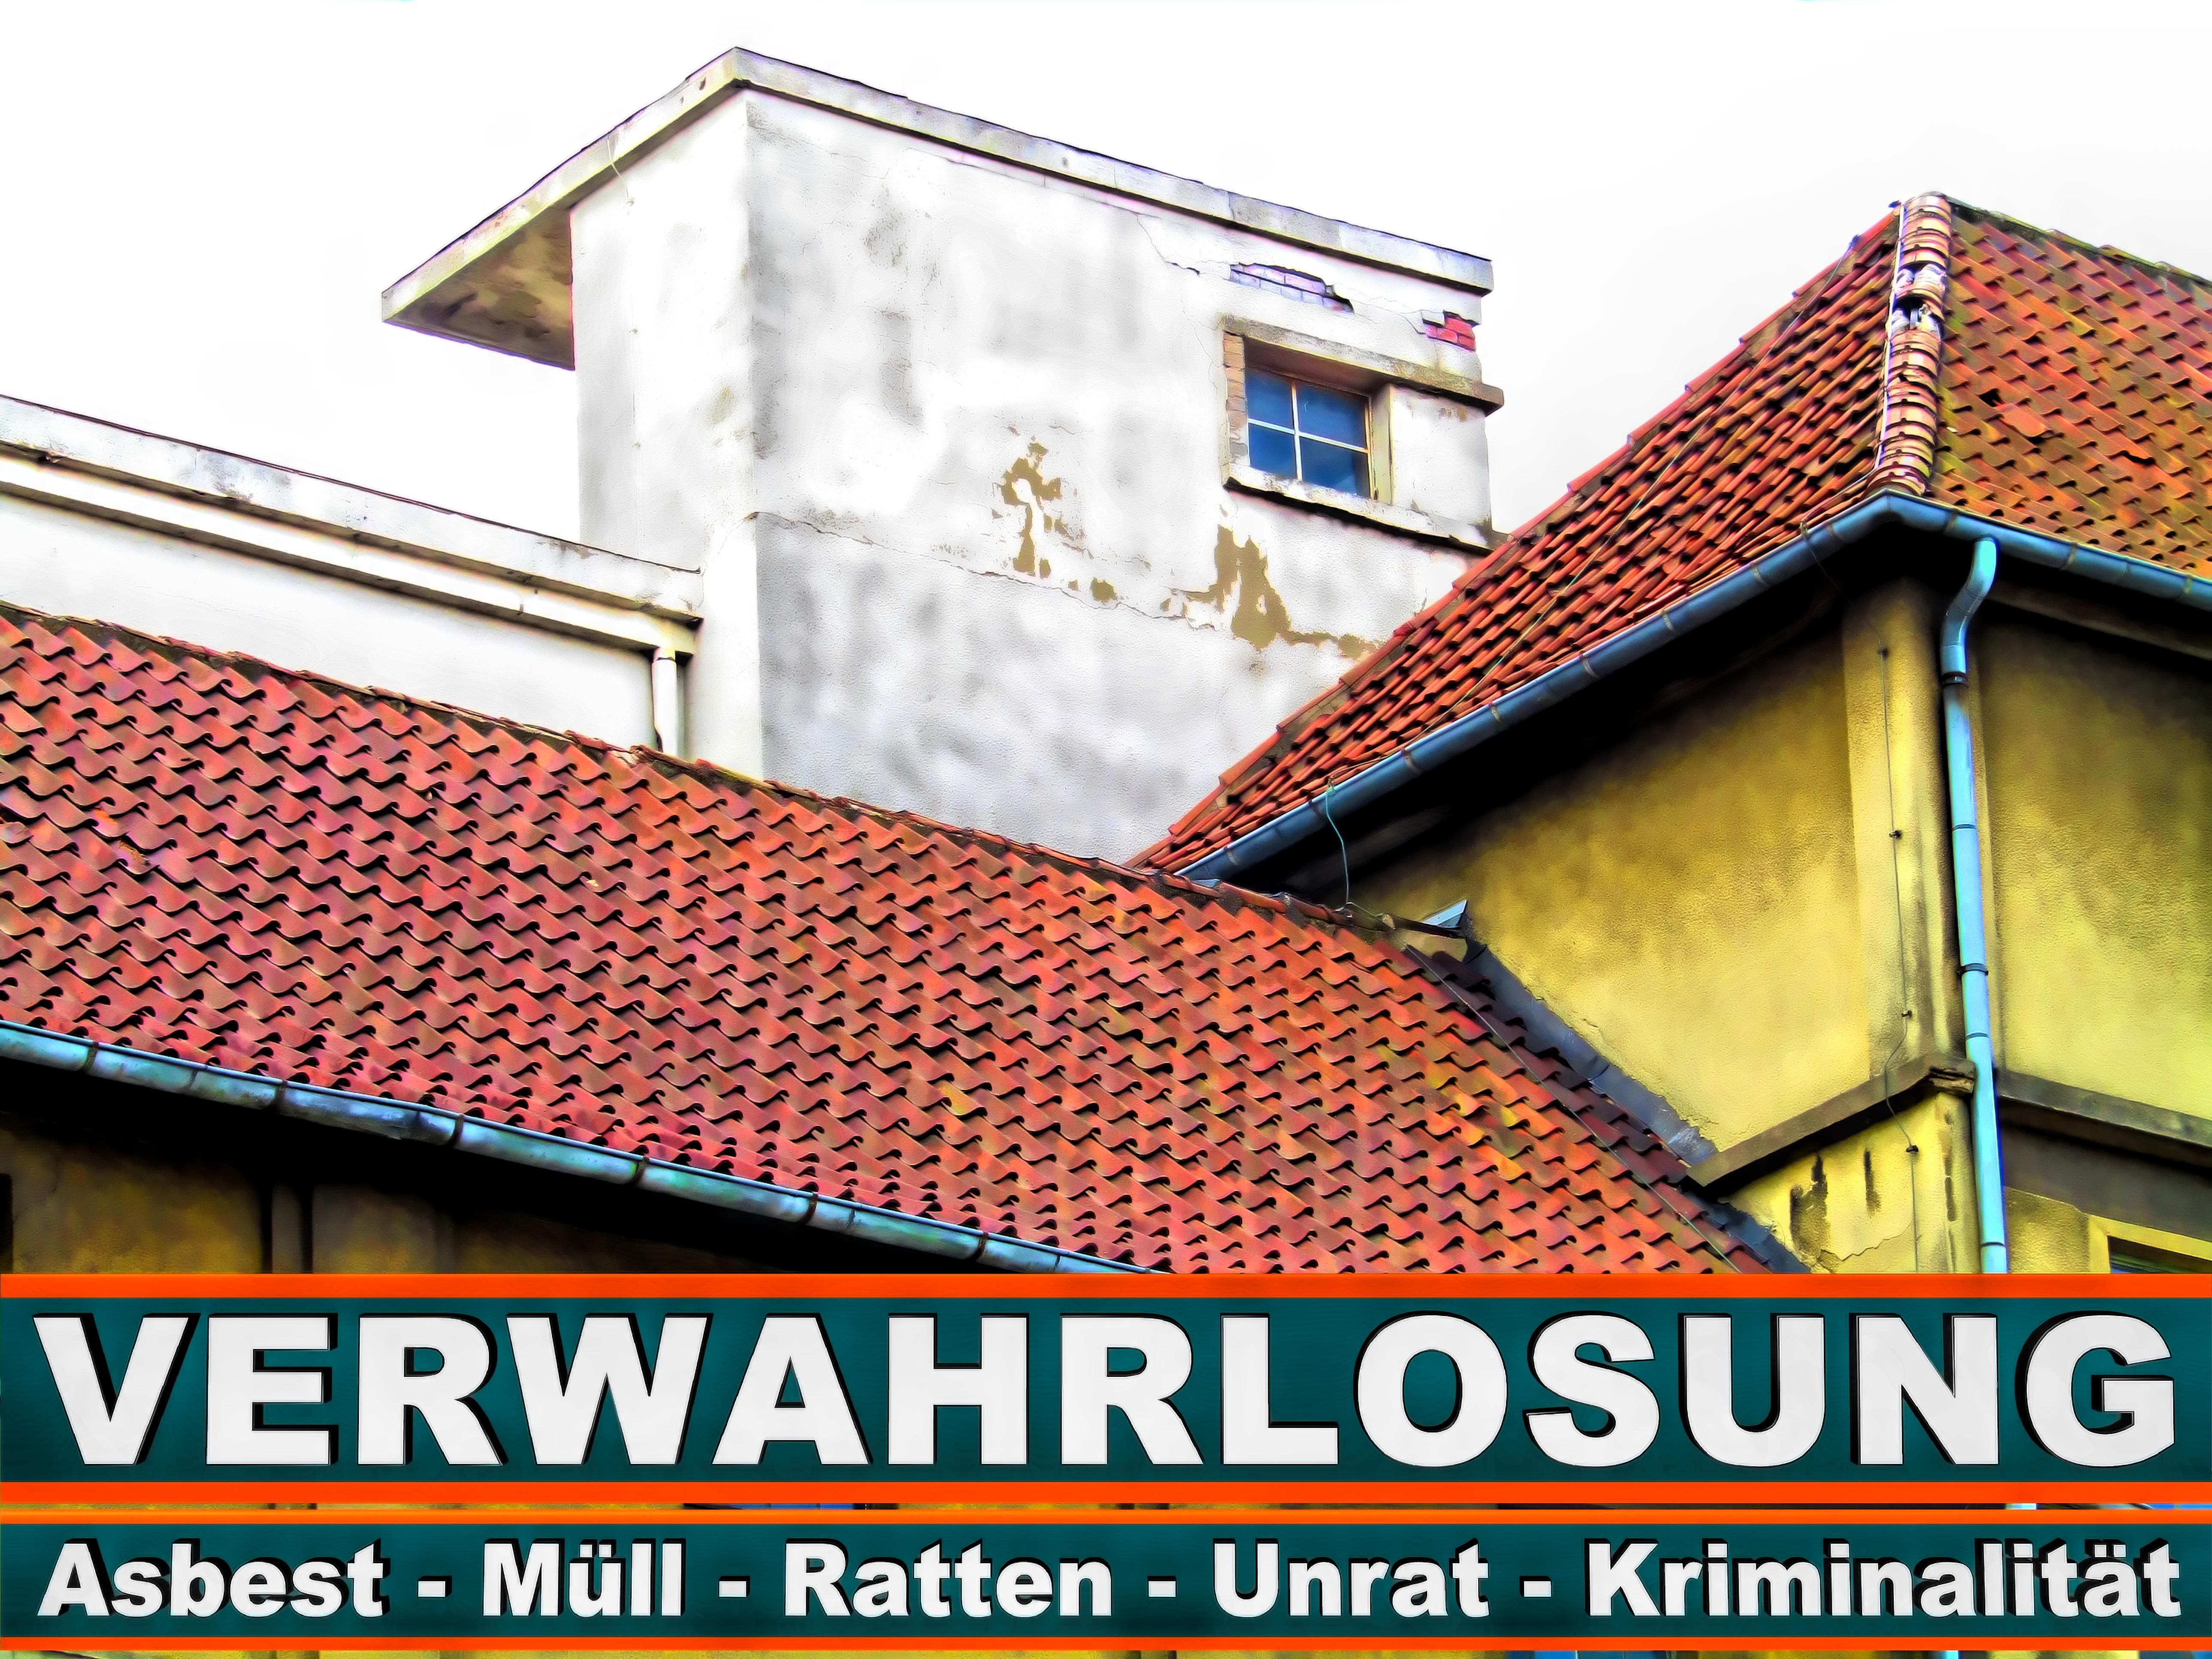 Öko Tech Park Bielefeld INDIE ROASTERS, ROSENDAHL & GERULAT GBR Torsten Rosendahl Krackser Str 12 024